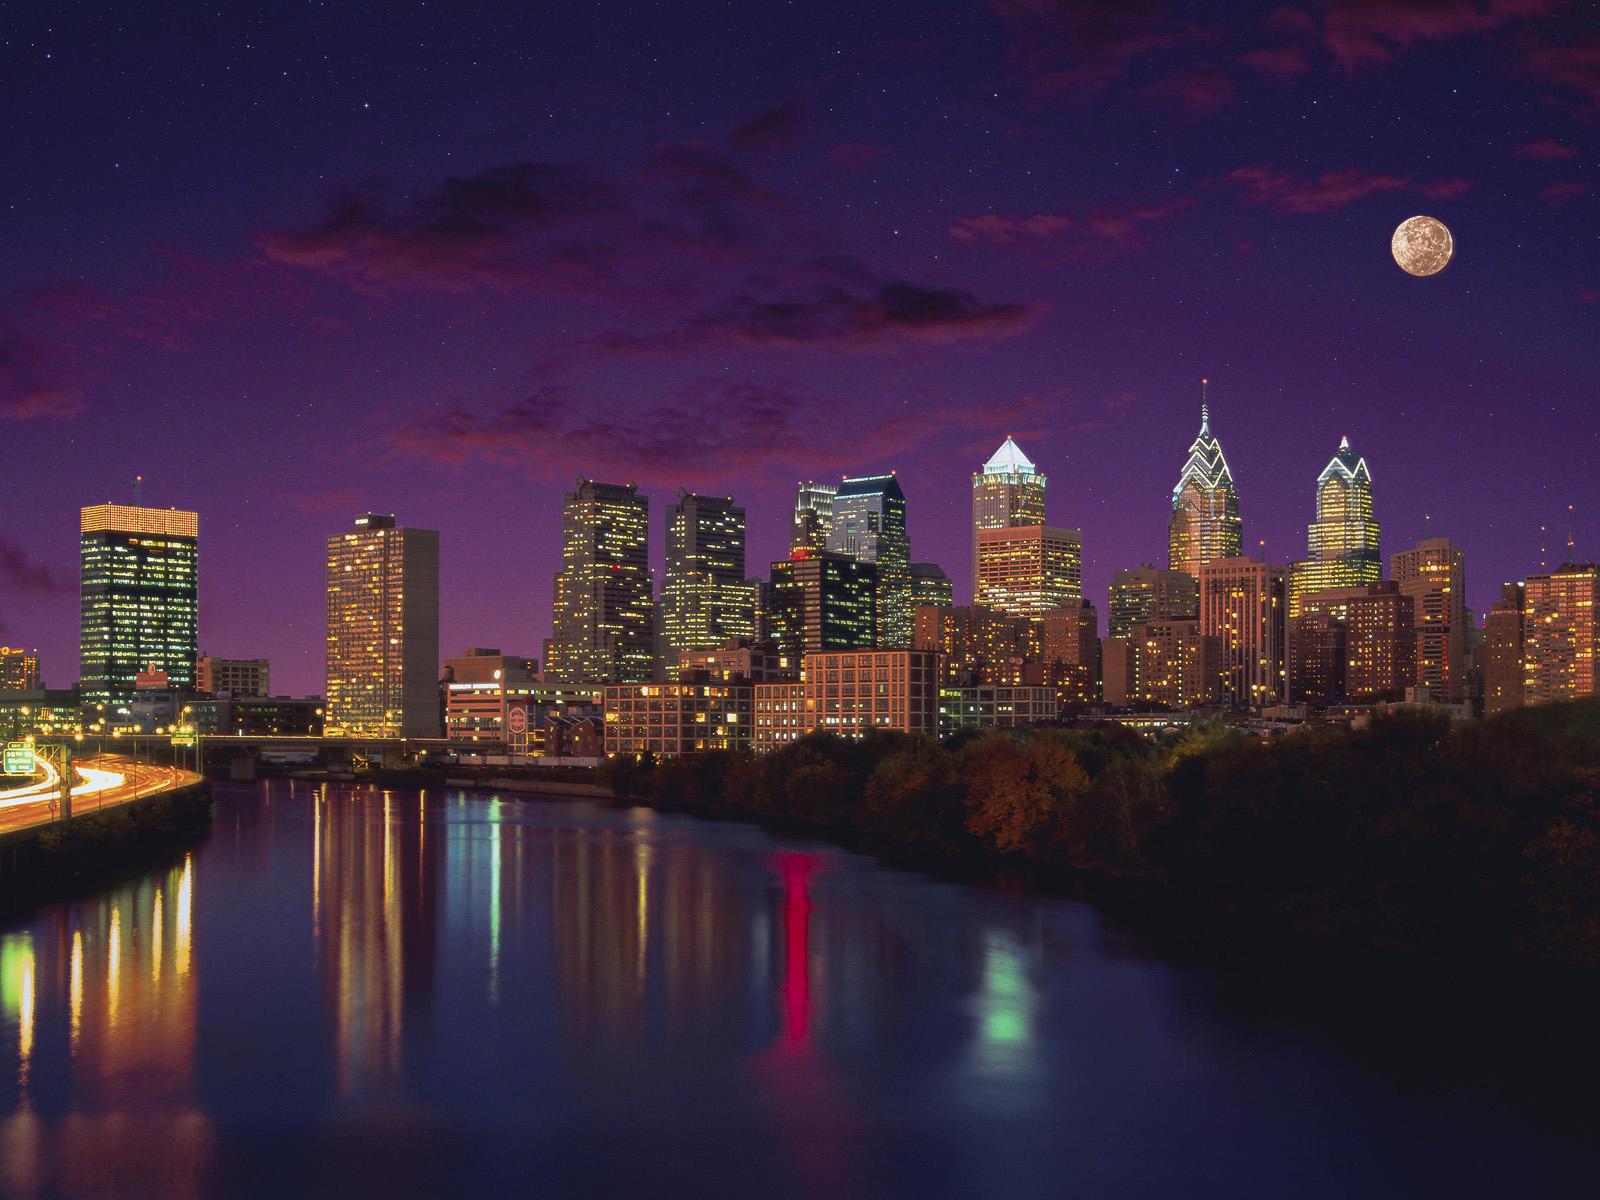 77 Philadelphia Skyline Wallpaper On Wallpapersafari